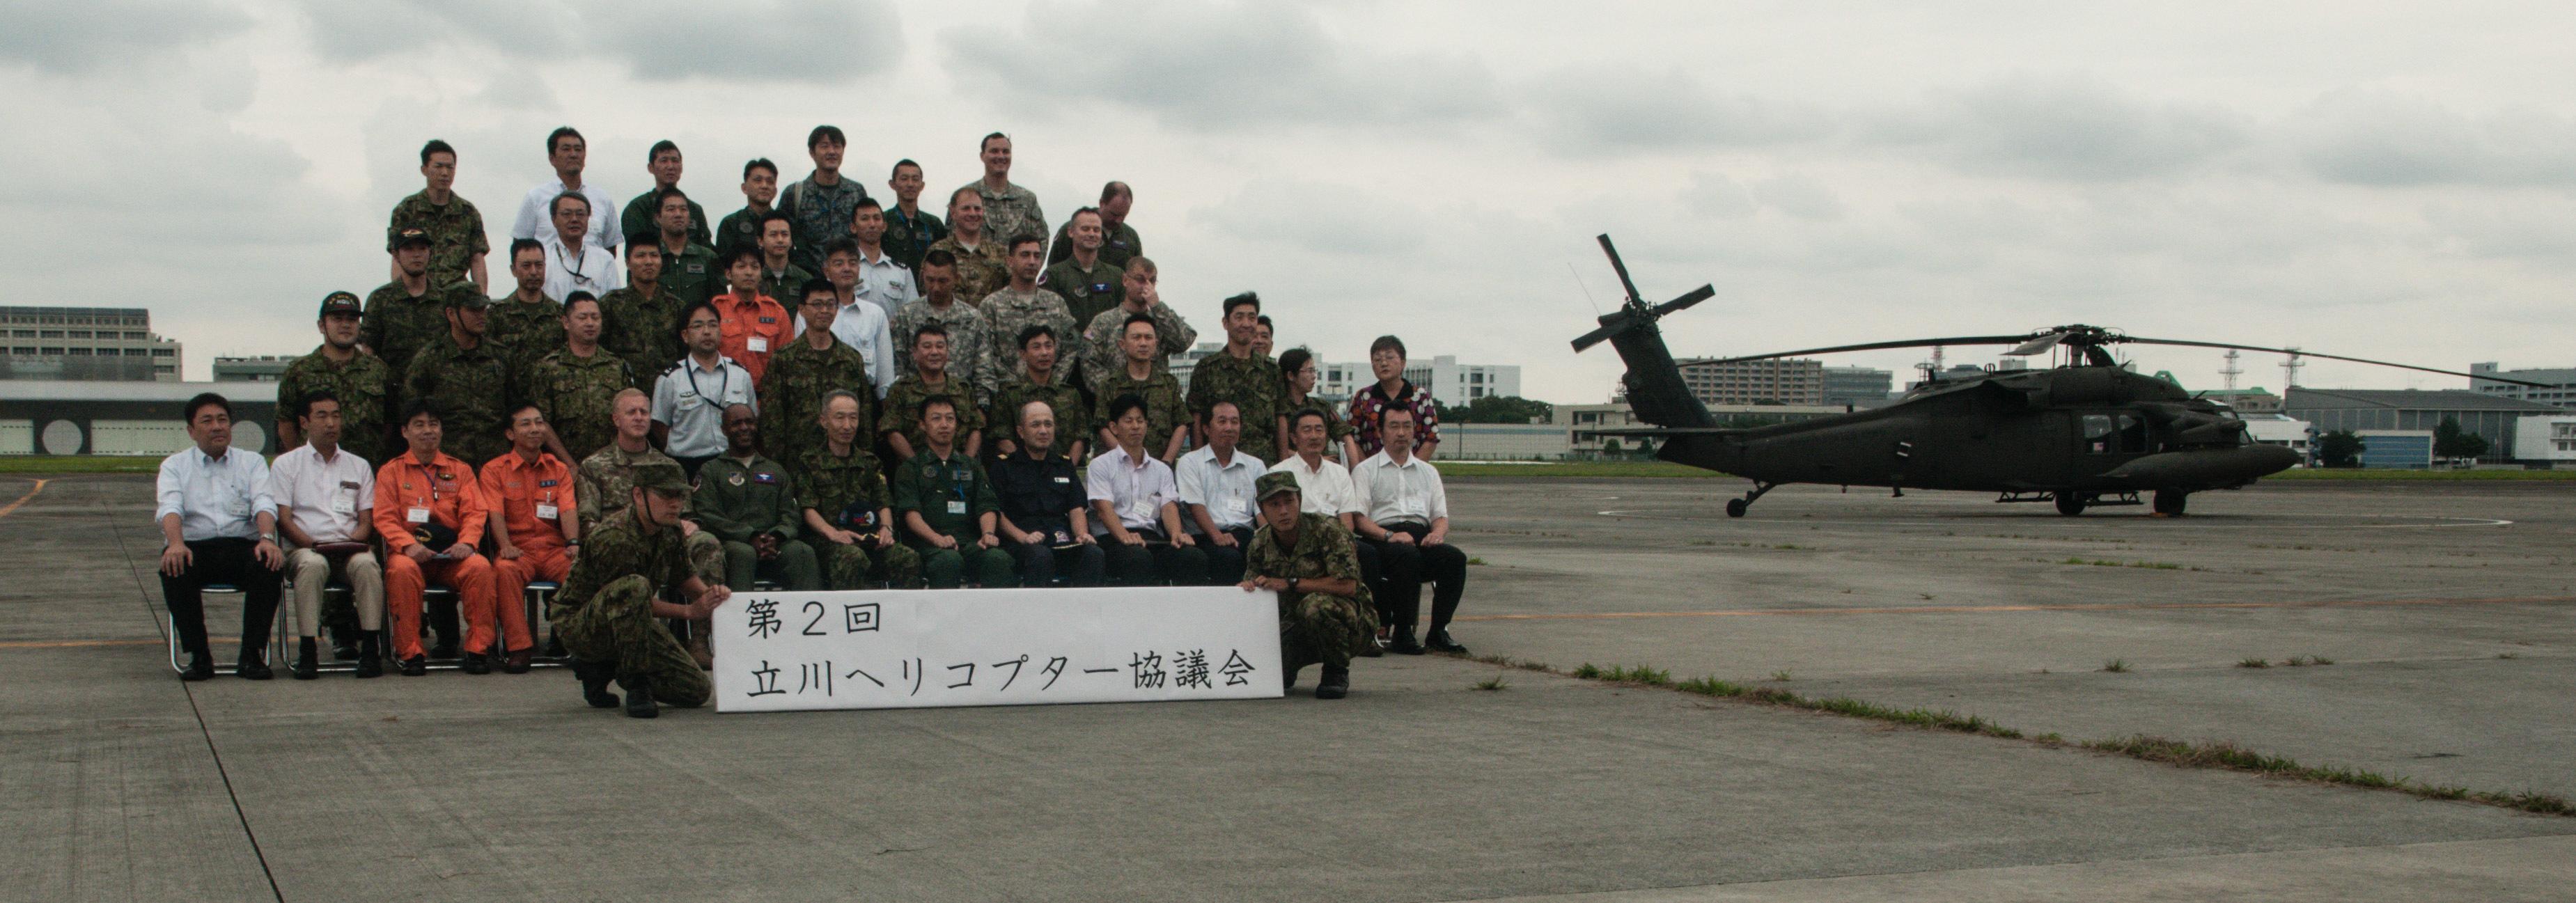 U S  Army Aviation Battalion Japan Joins American, Japanese Rotary